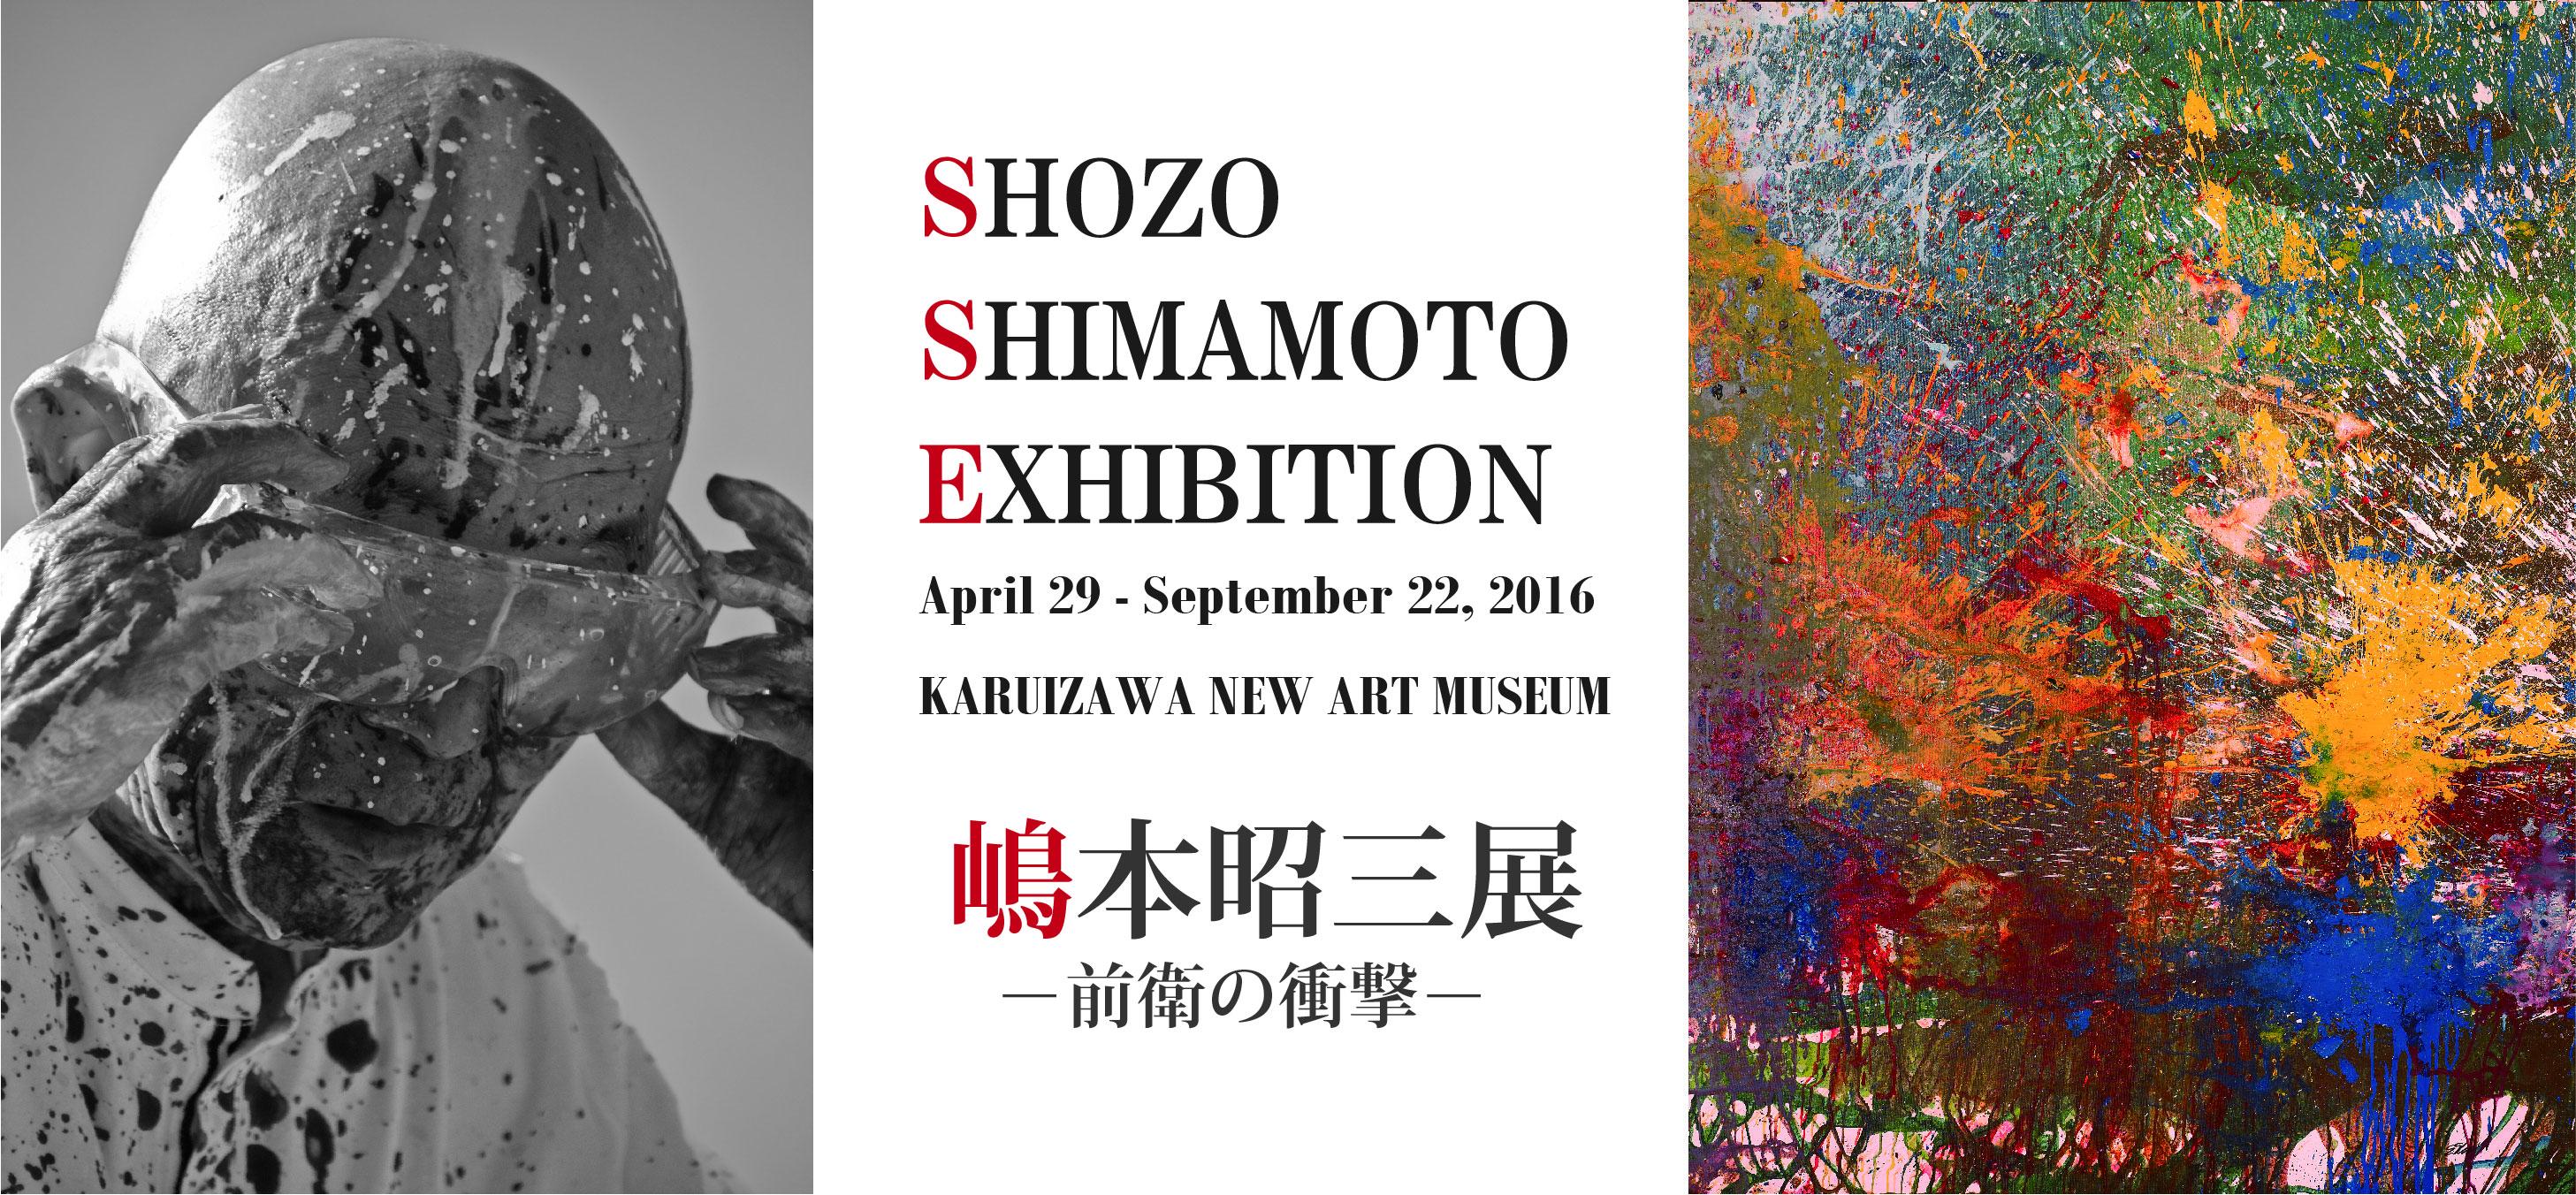 shozoshimamotoexhibition